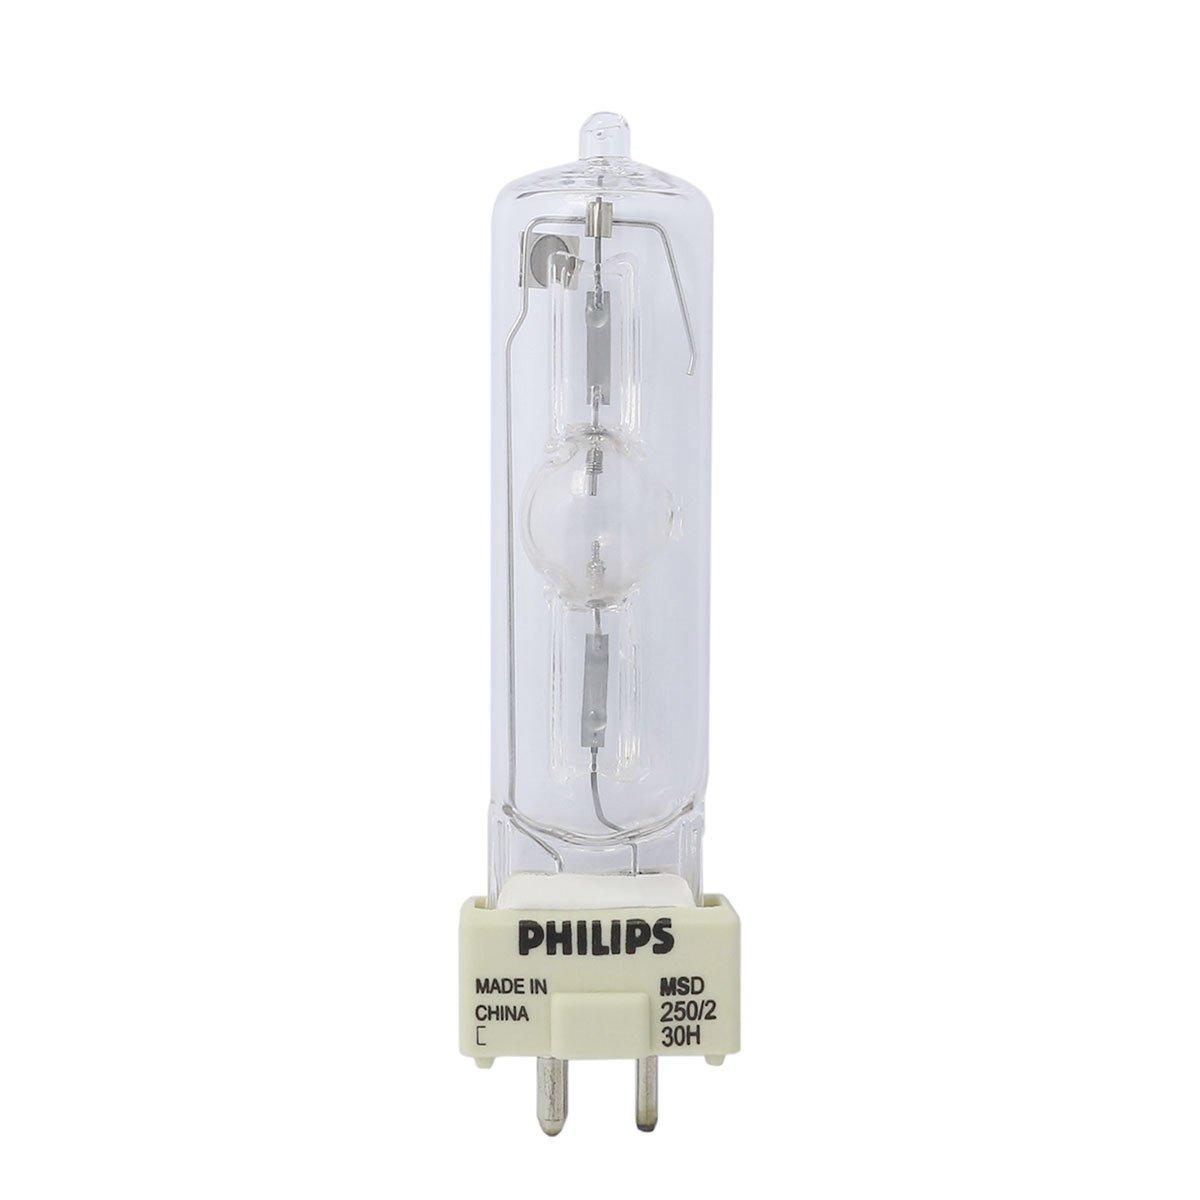 Philips Broadway MSD 250/2 30H Philips 228066